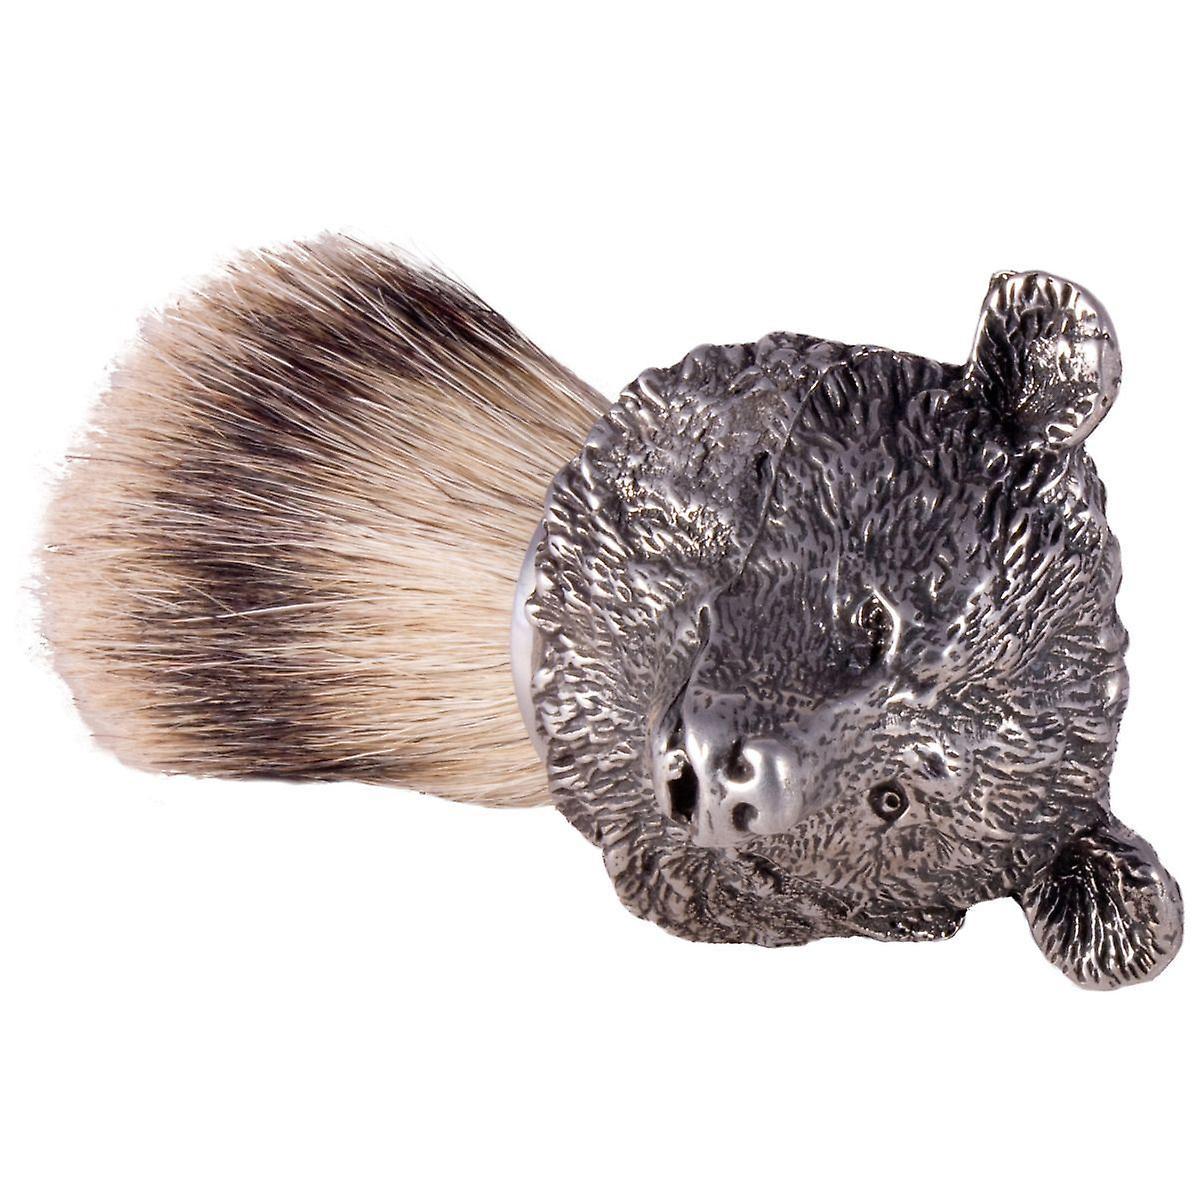 The English Pewter Co Silvertip Badger Hair Shaving Brush-Bear